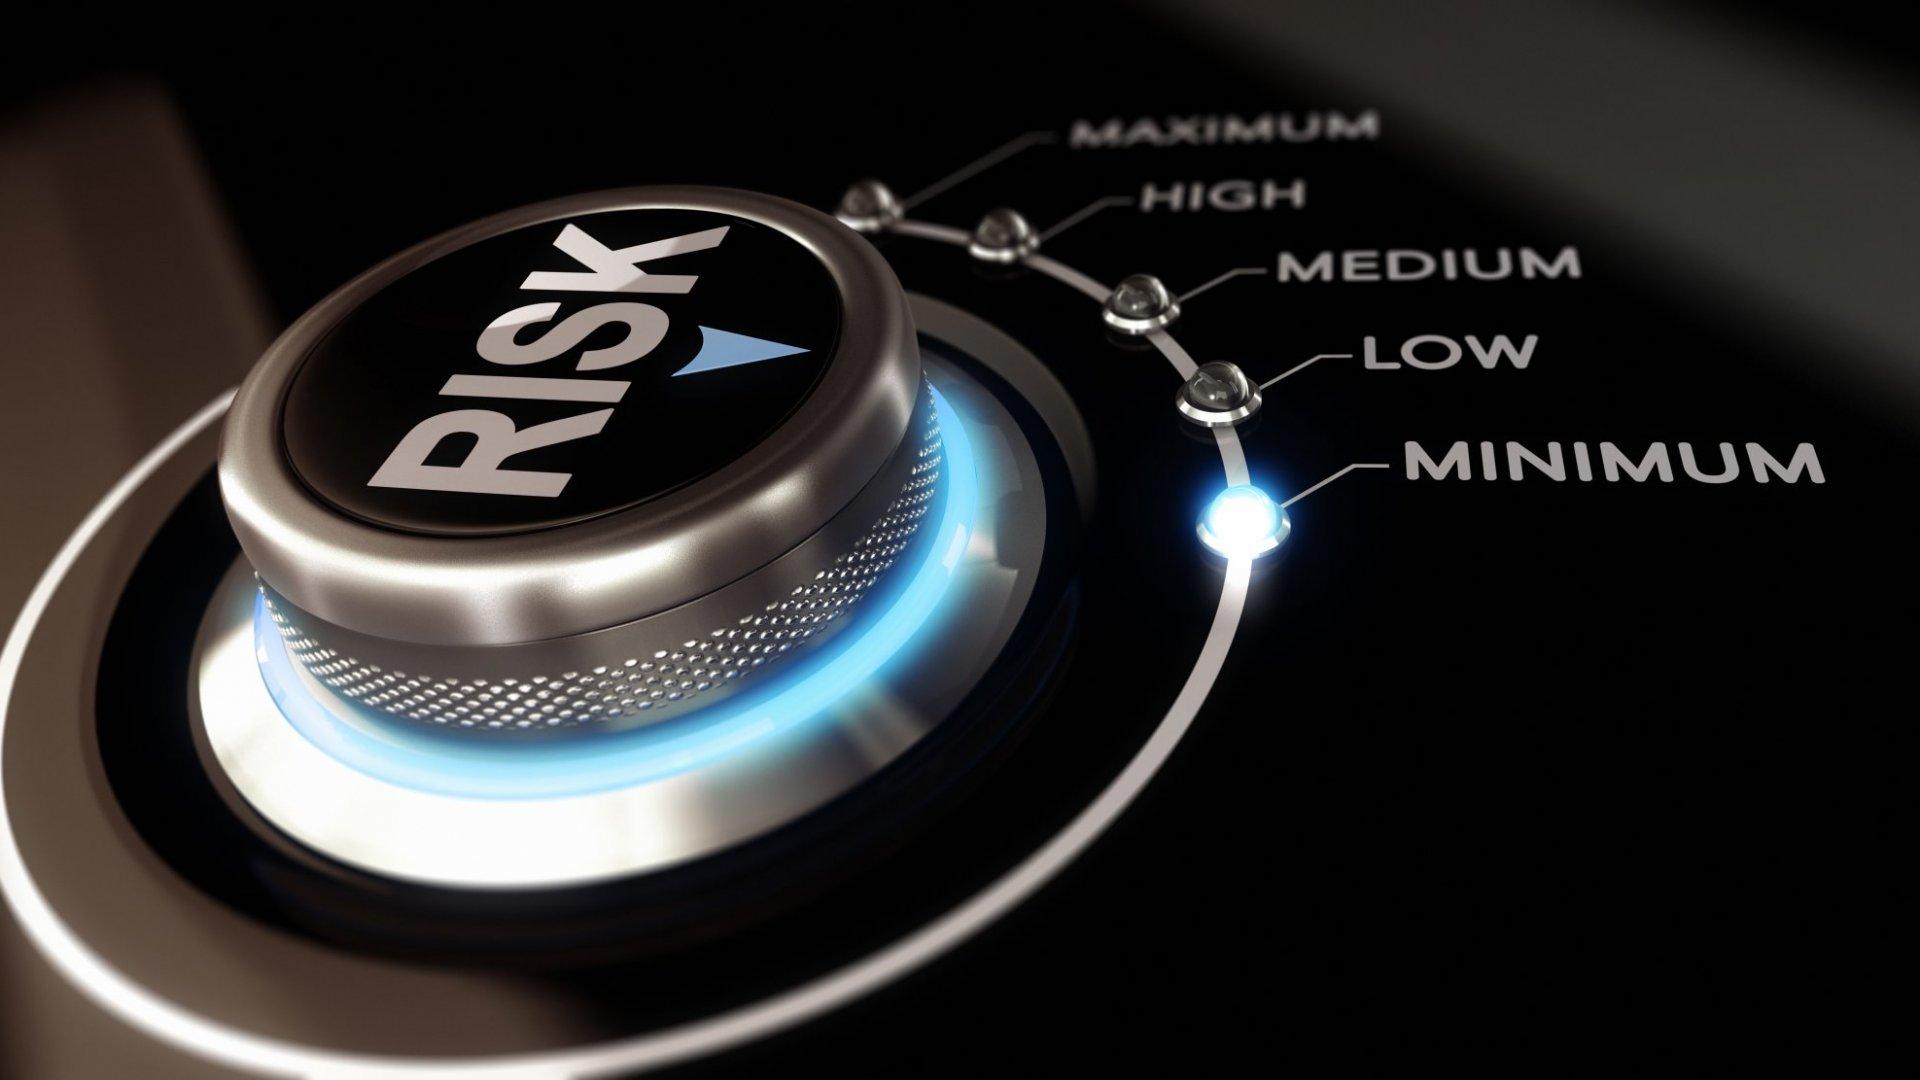 3 Strategies for Entrepreneurs Seeking Low-Risk Growth